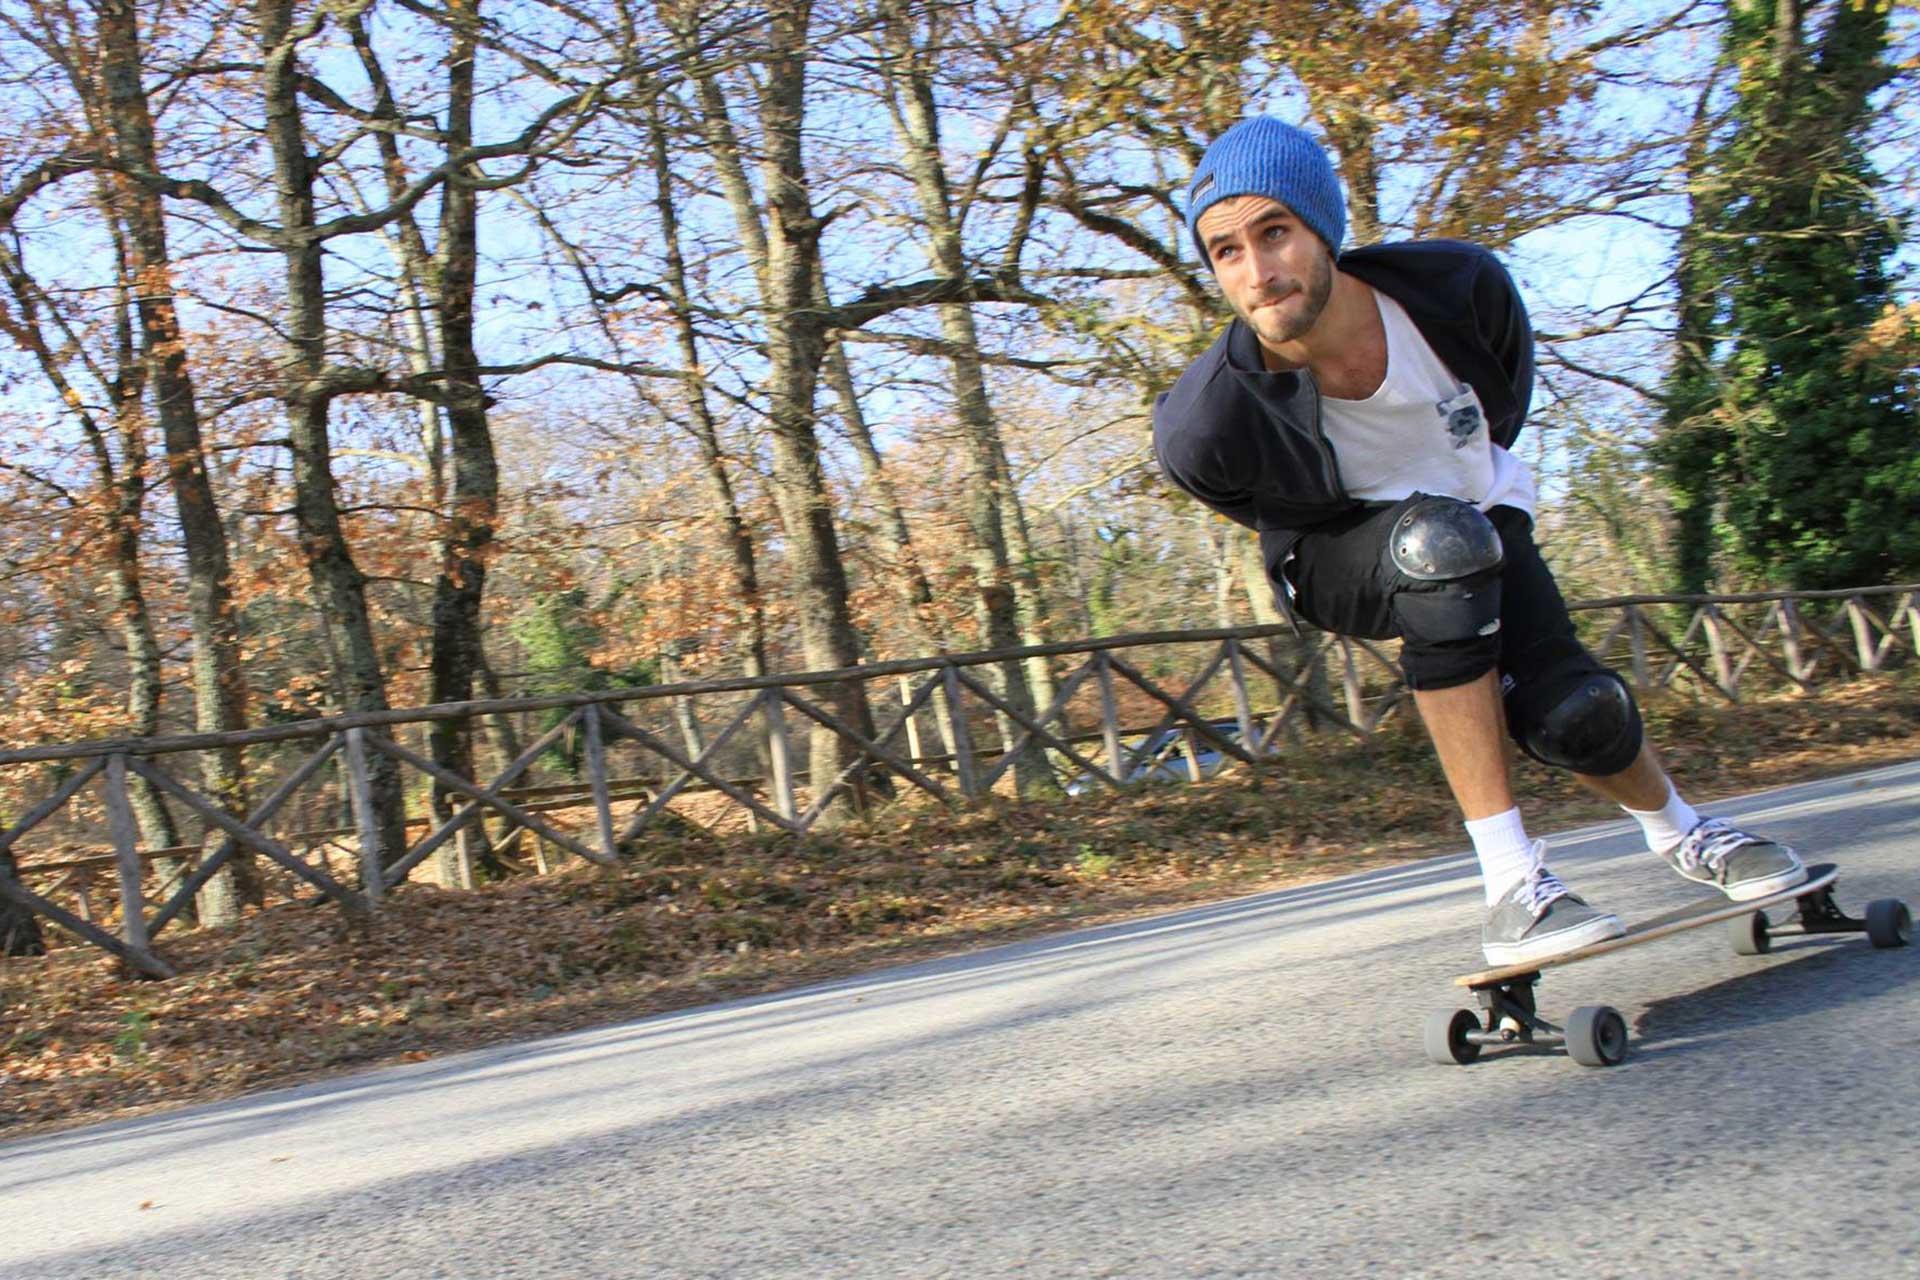 Emanuele Minutello Fumetti Lines Skateboard_11